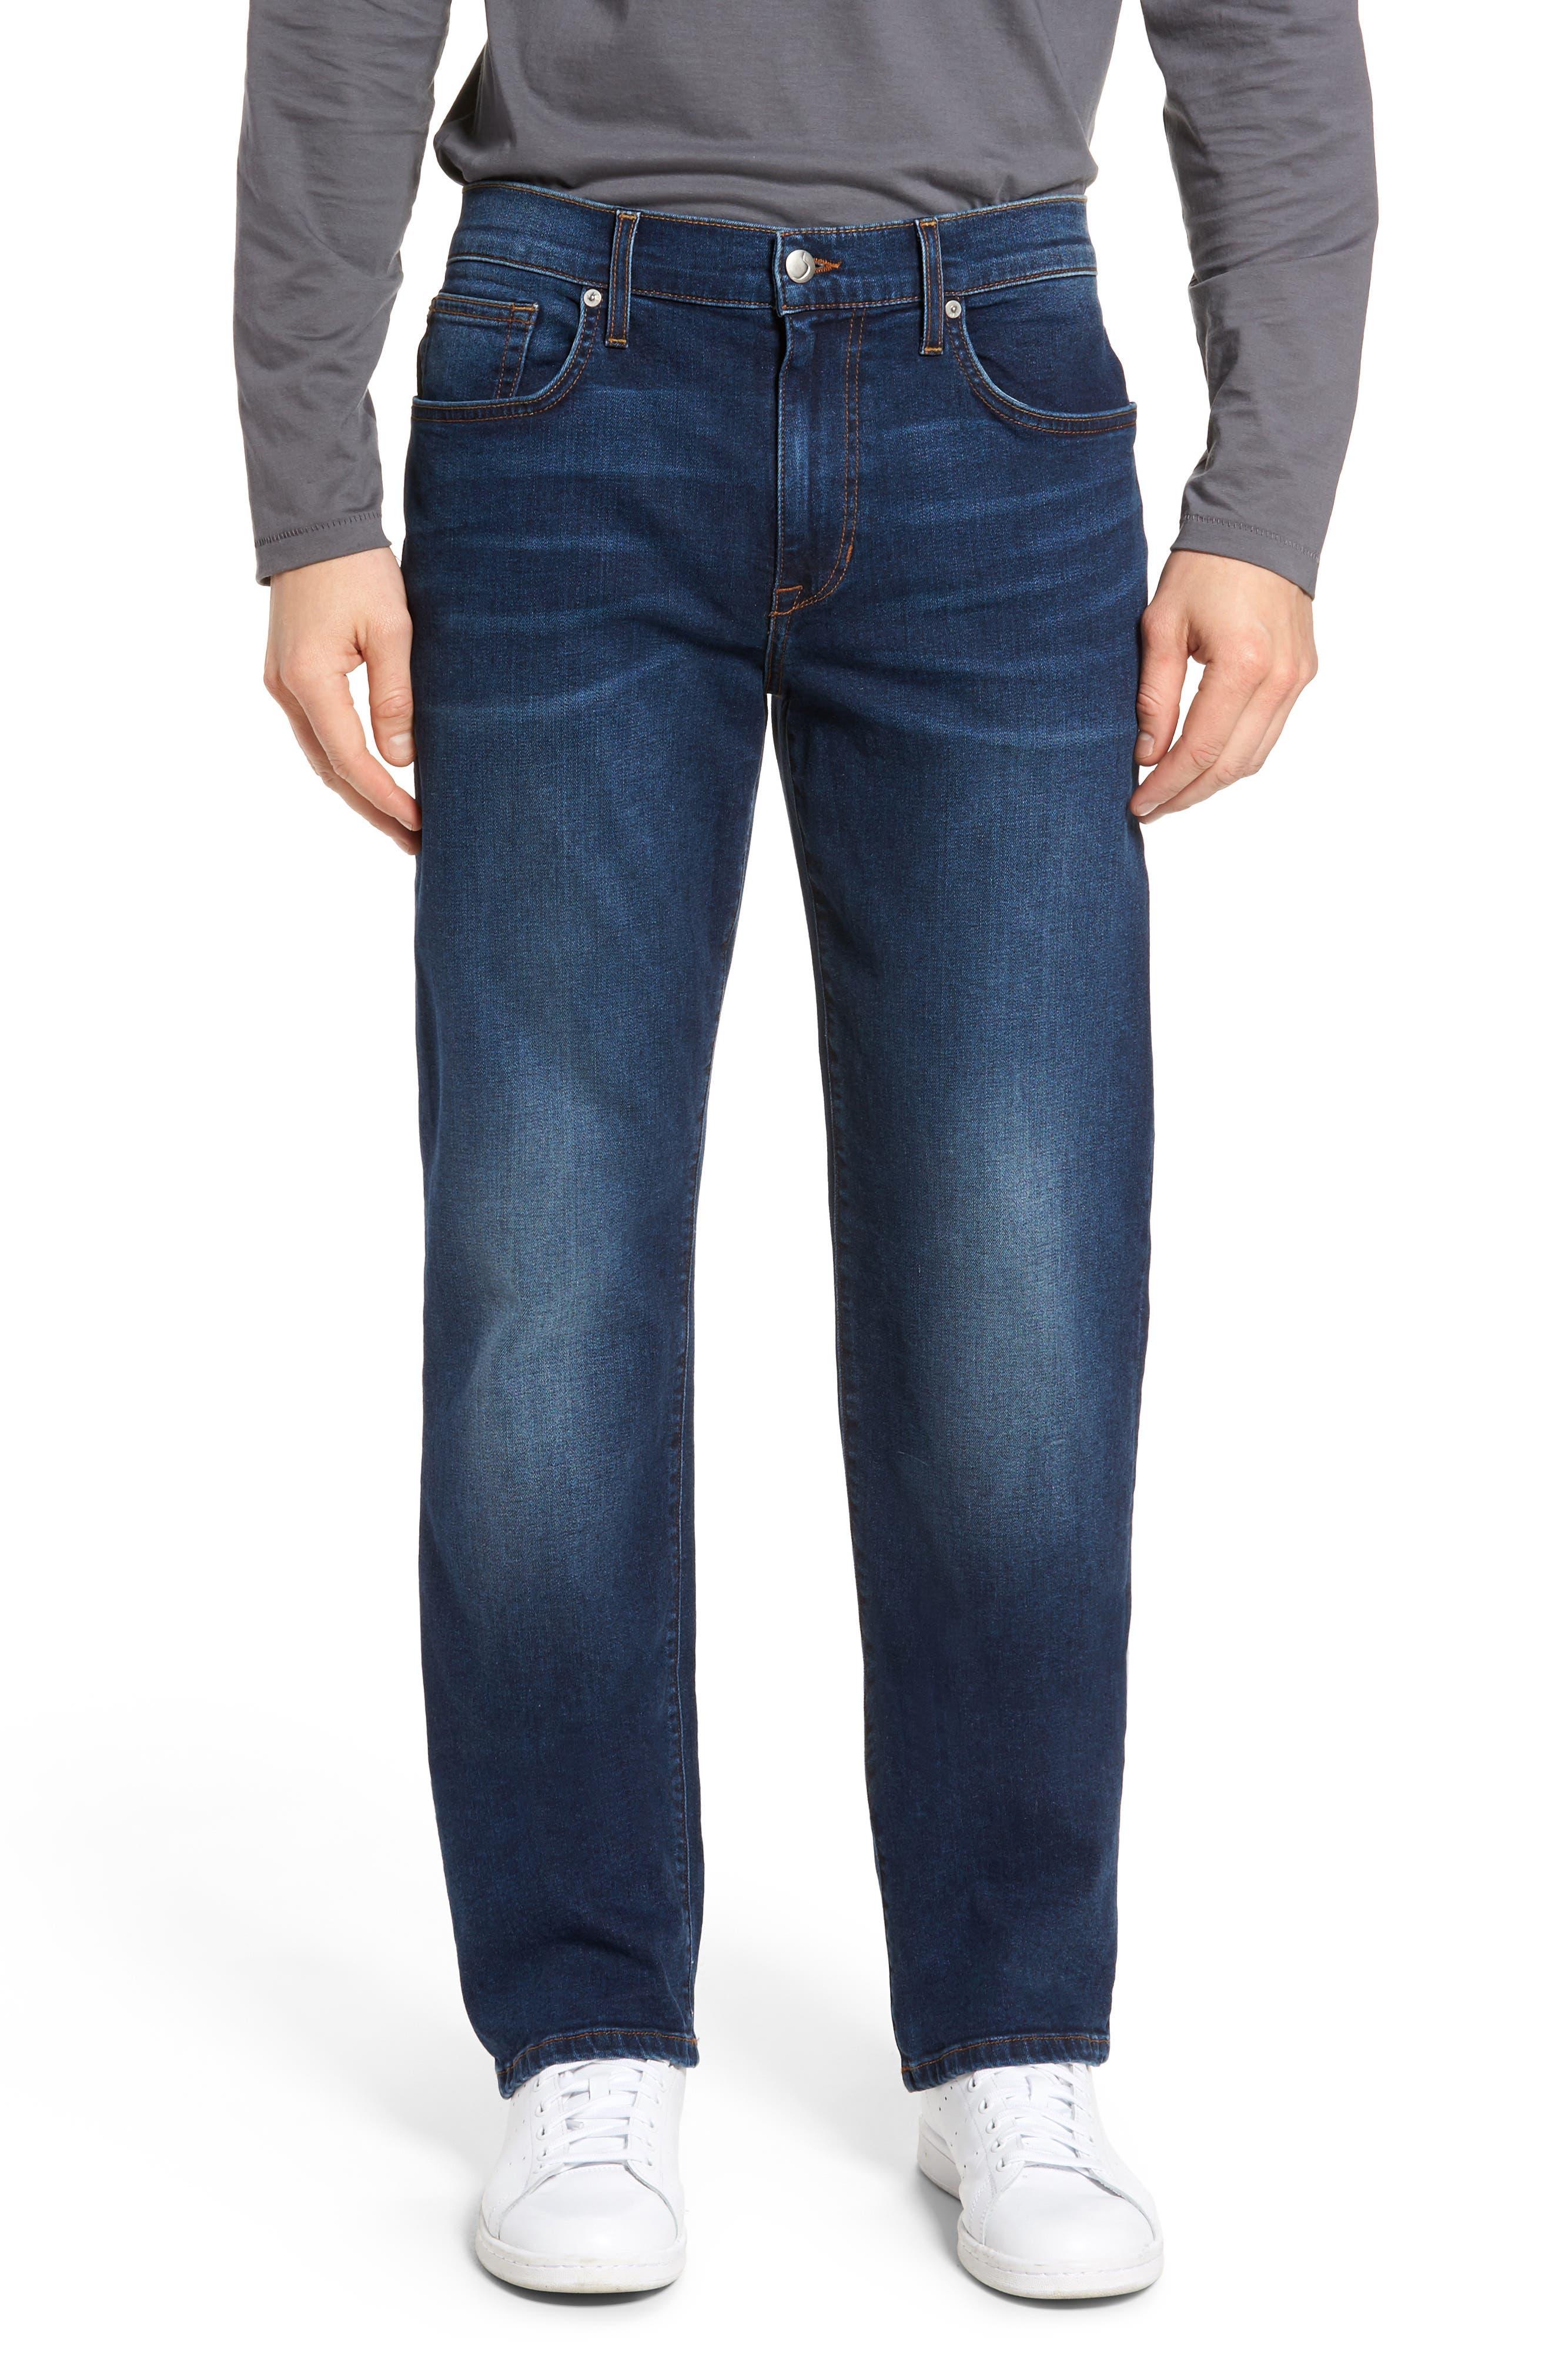 Brixton Slim Straight Leg Jeans,                         Main,                         color, Line